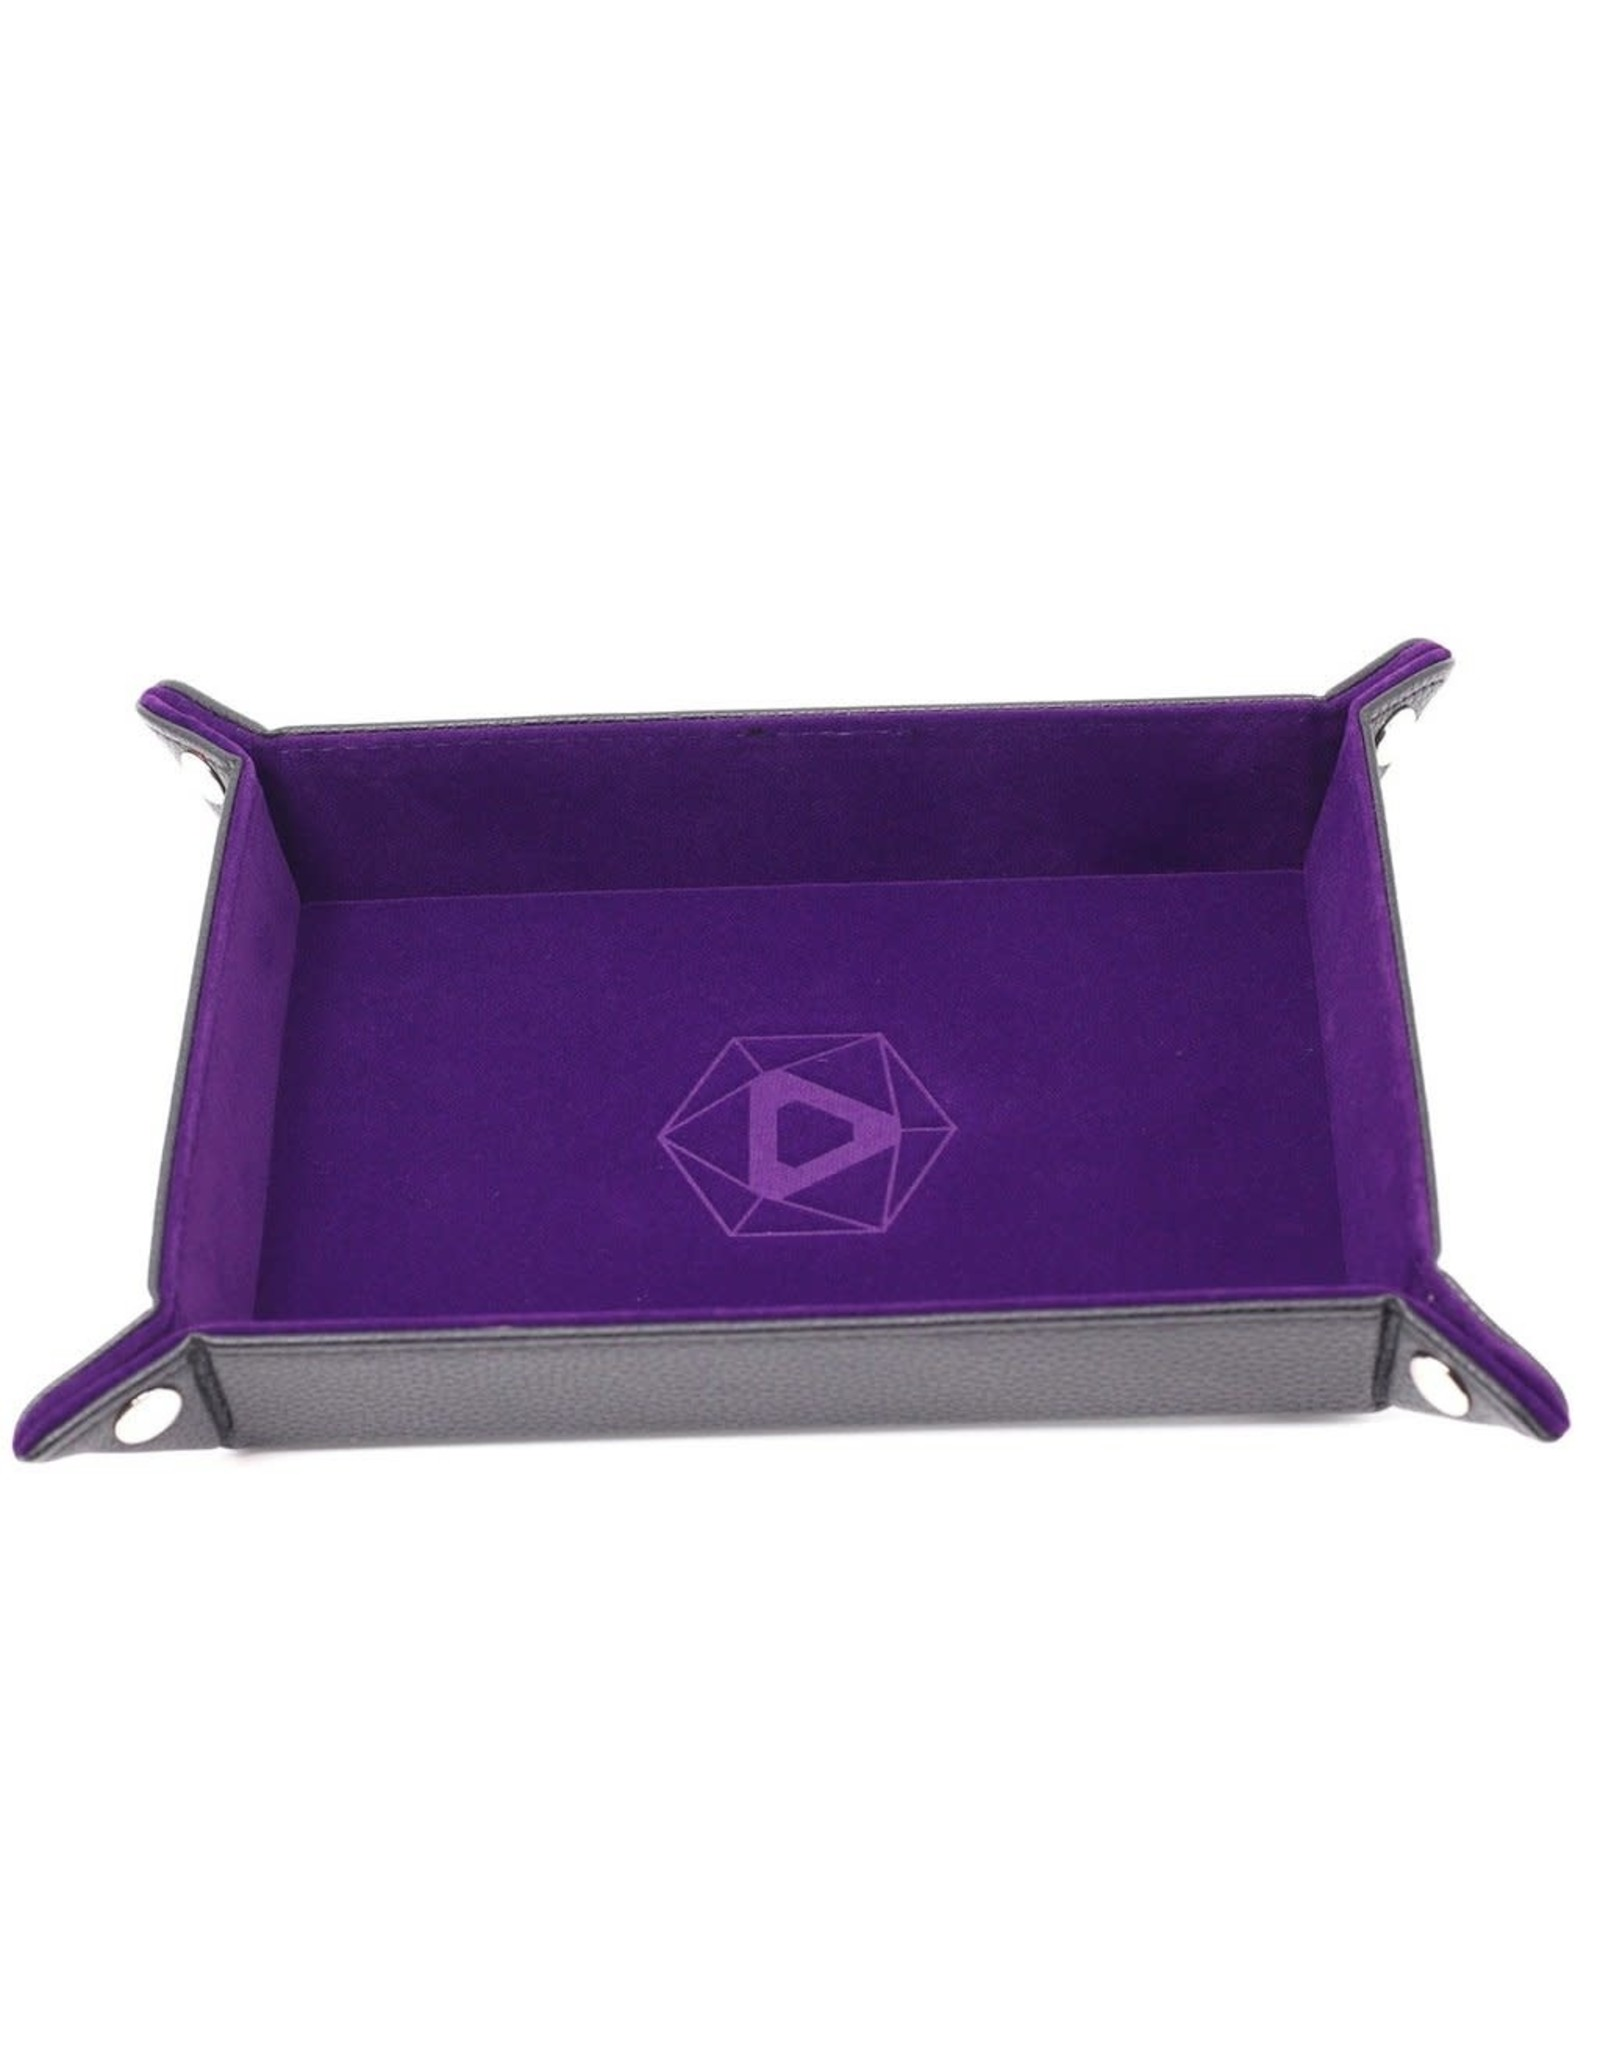 Die Hard Dice Die-Hard-Dice: Folding Rectangle Tray - Purple Velvet